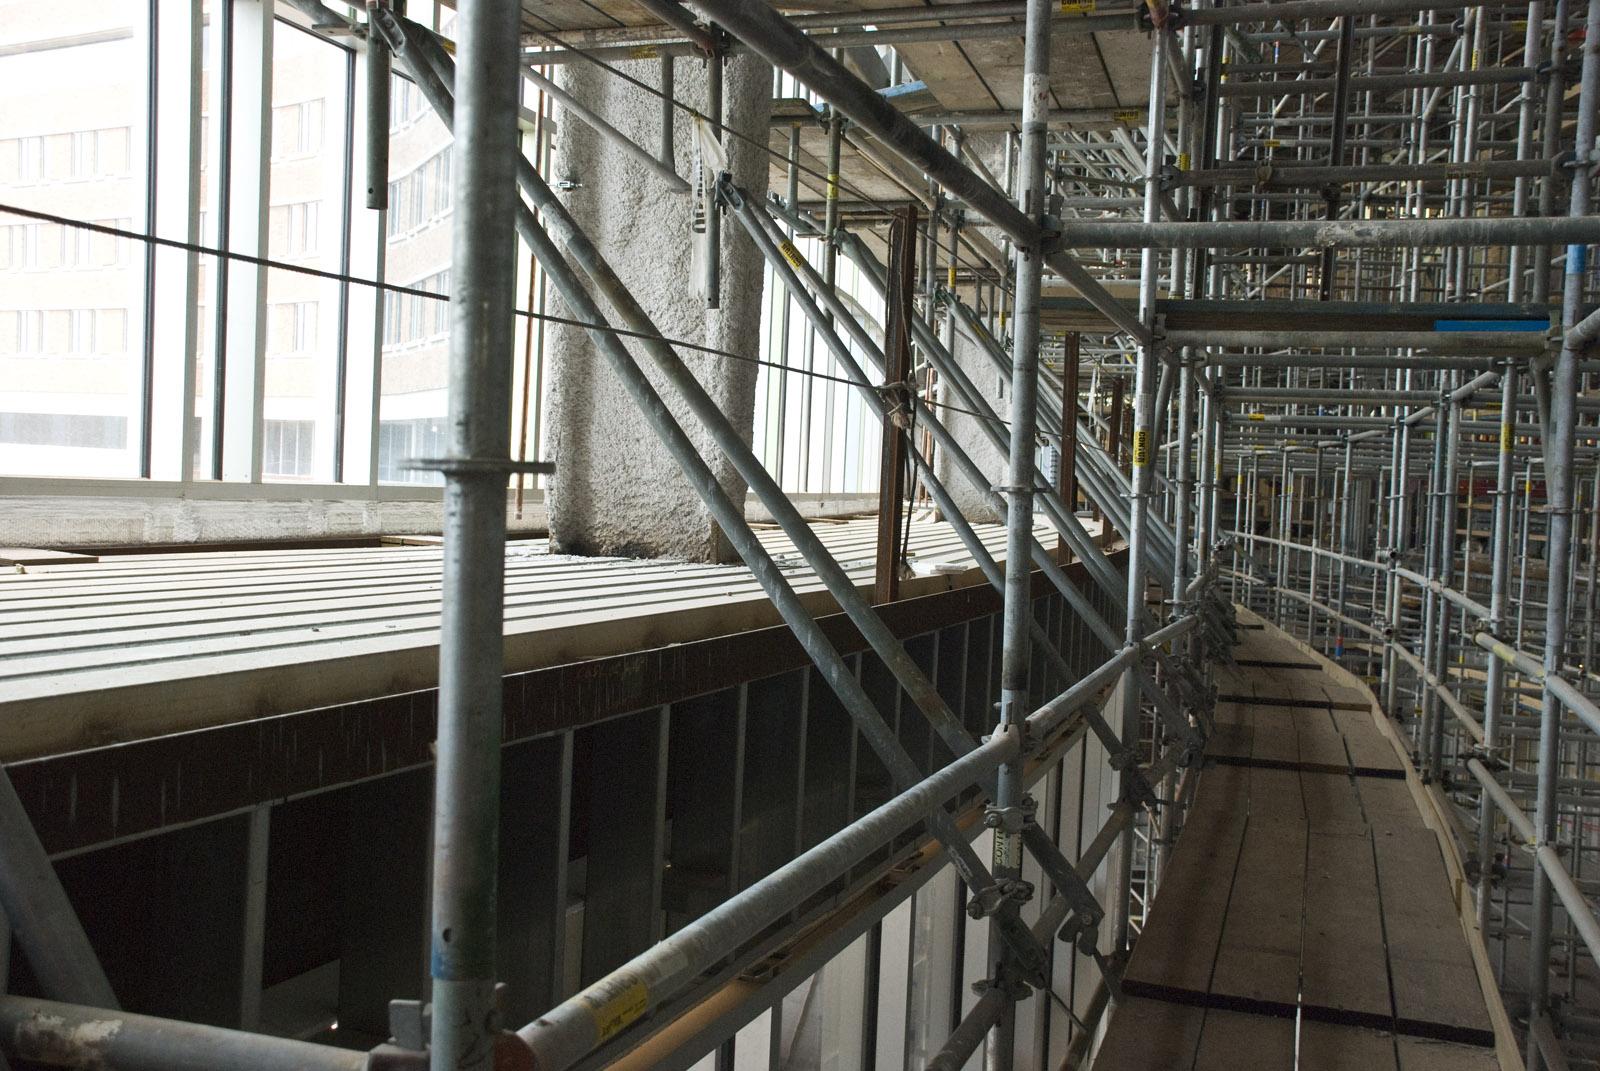 scaffold-rent-scaffolding-superior-scaffold-system-scaffold-atrium-hospital-nj-new-jersey-82